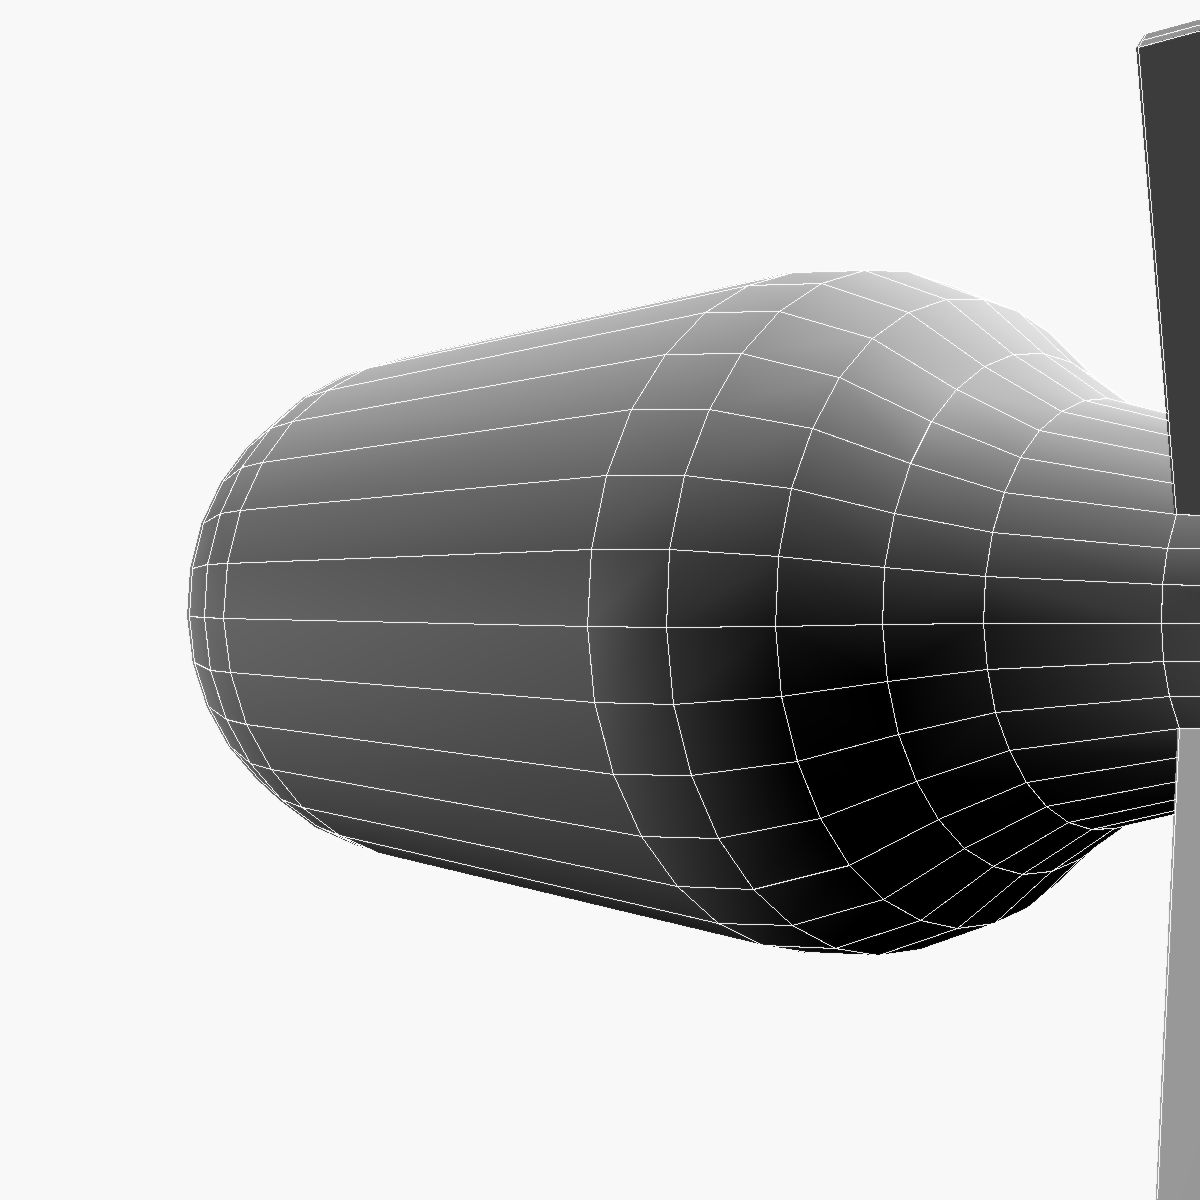 Bomb, Jolly Roger scheme 3d model 3ds dxf fbx blend cob dae X obj 162681